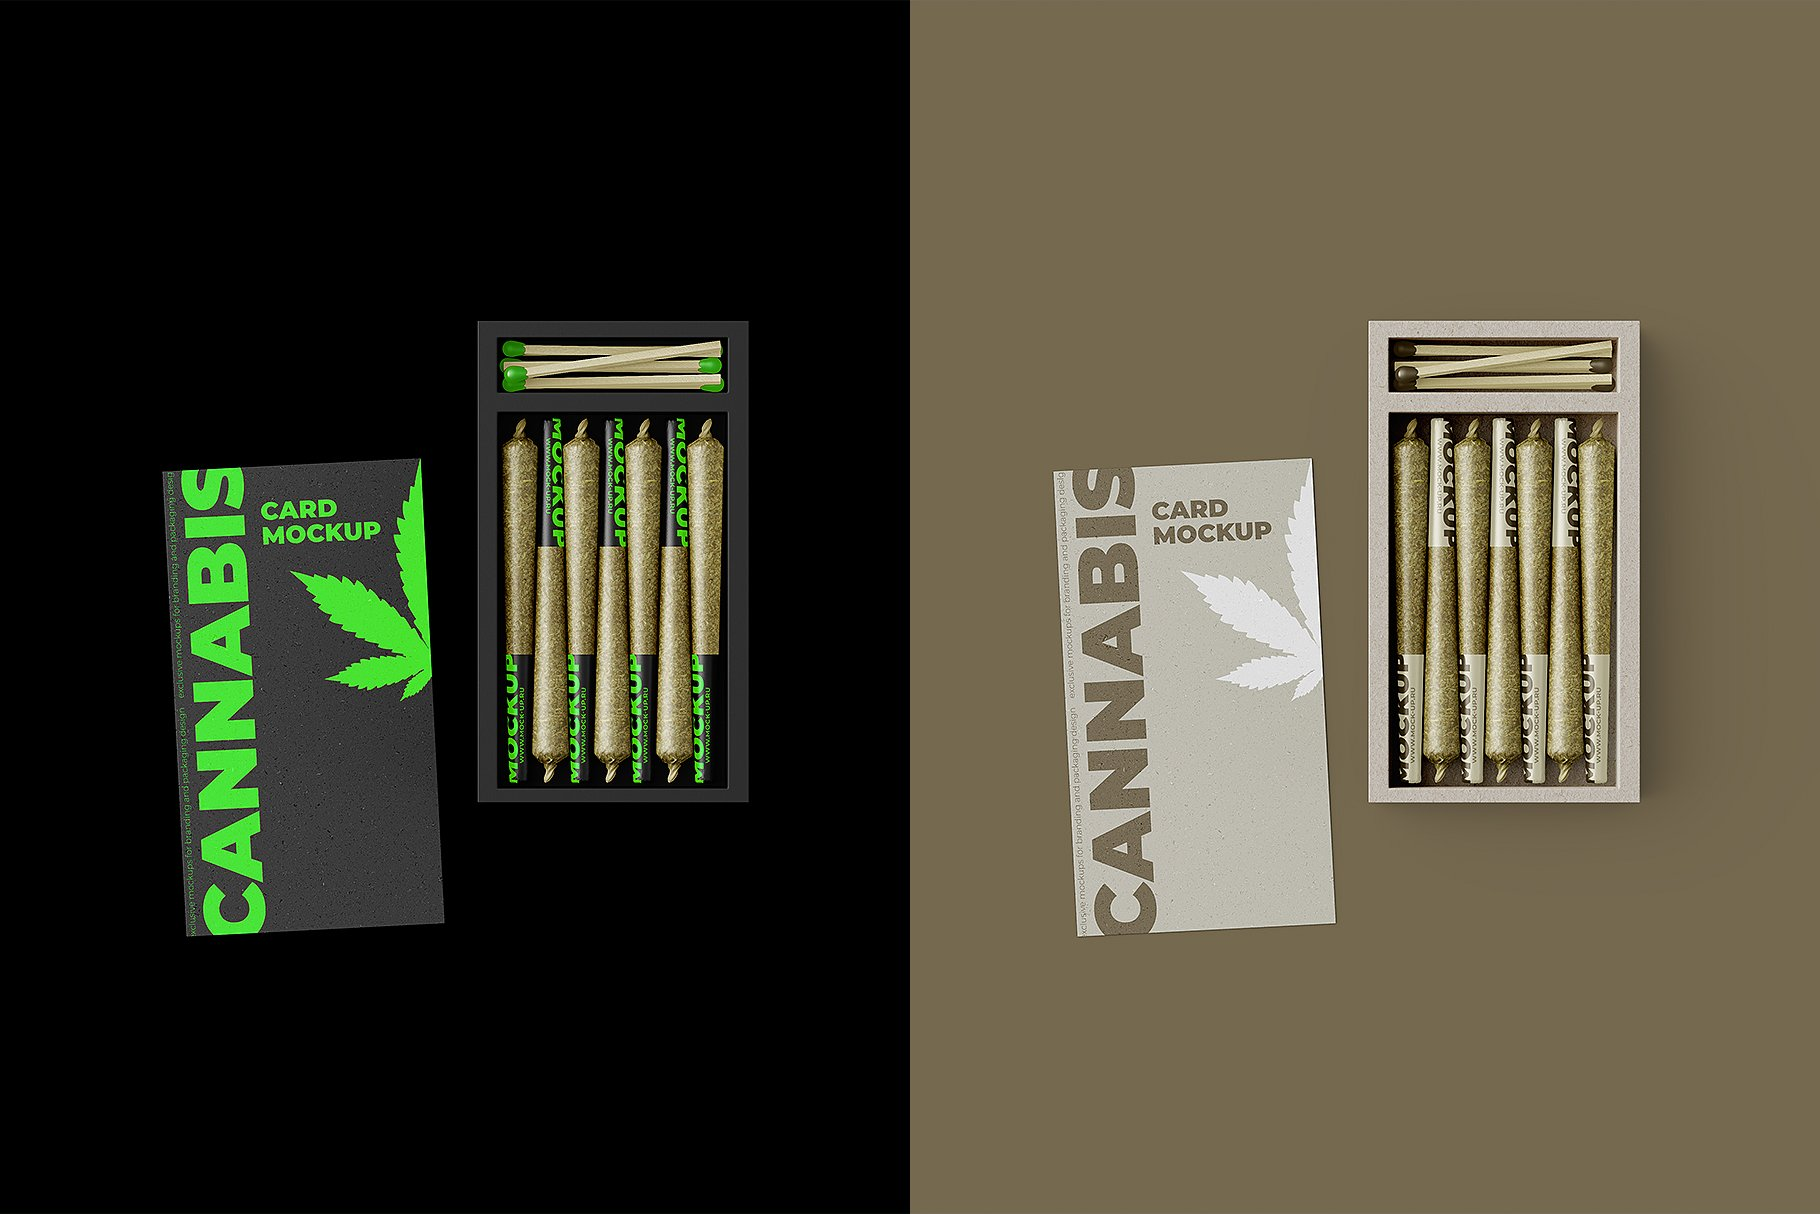 烟草香烟雪茄包装纸盒设计展示贴图样机 Weed Joint Packaging Mockup插图12